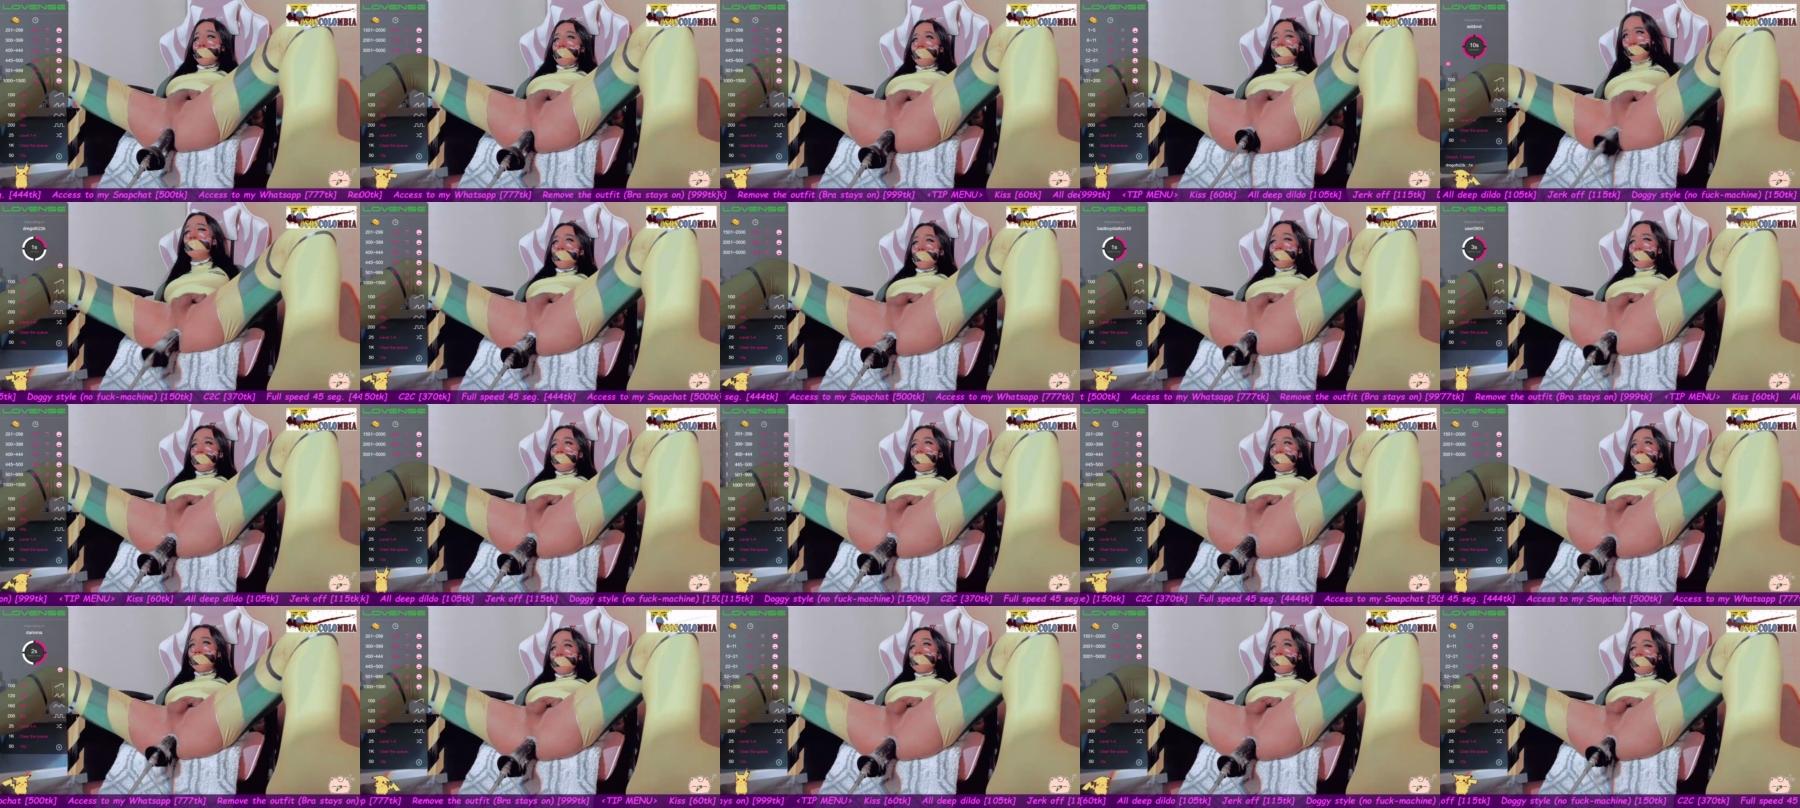 Kate_Yoshy Webcam CAM SHOW @ Chaturbate 31-07-2021